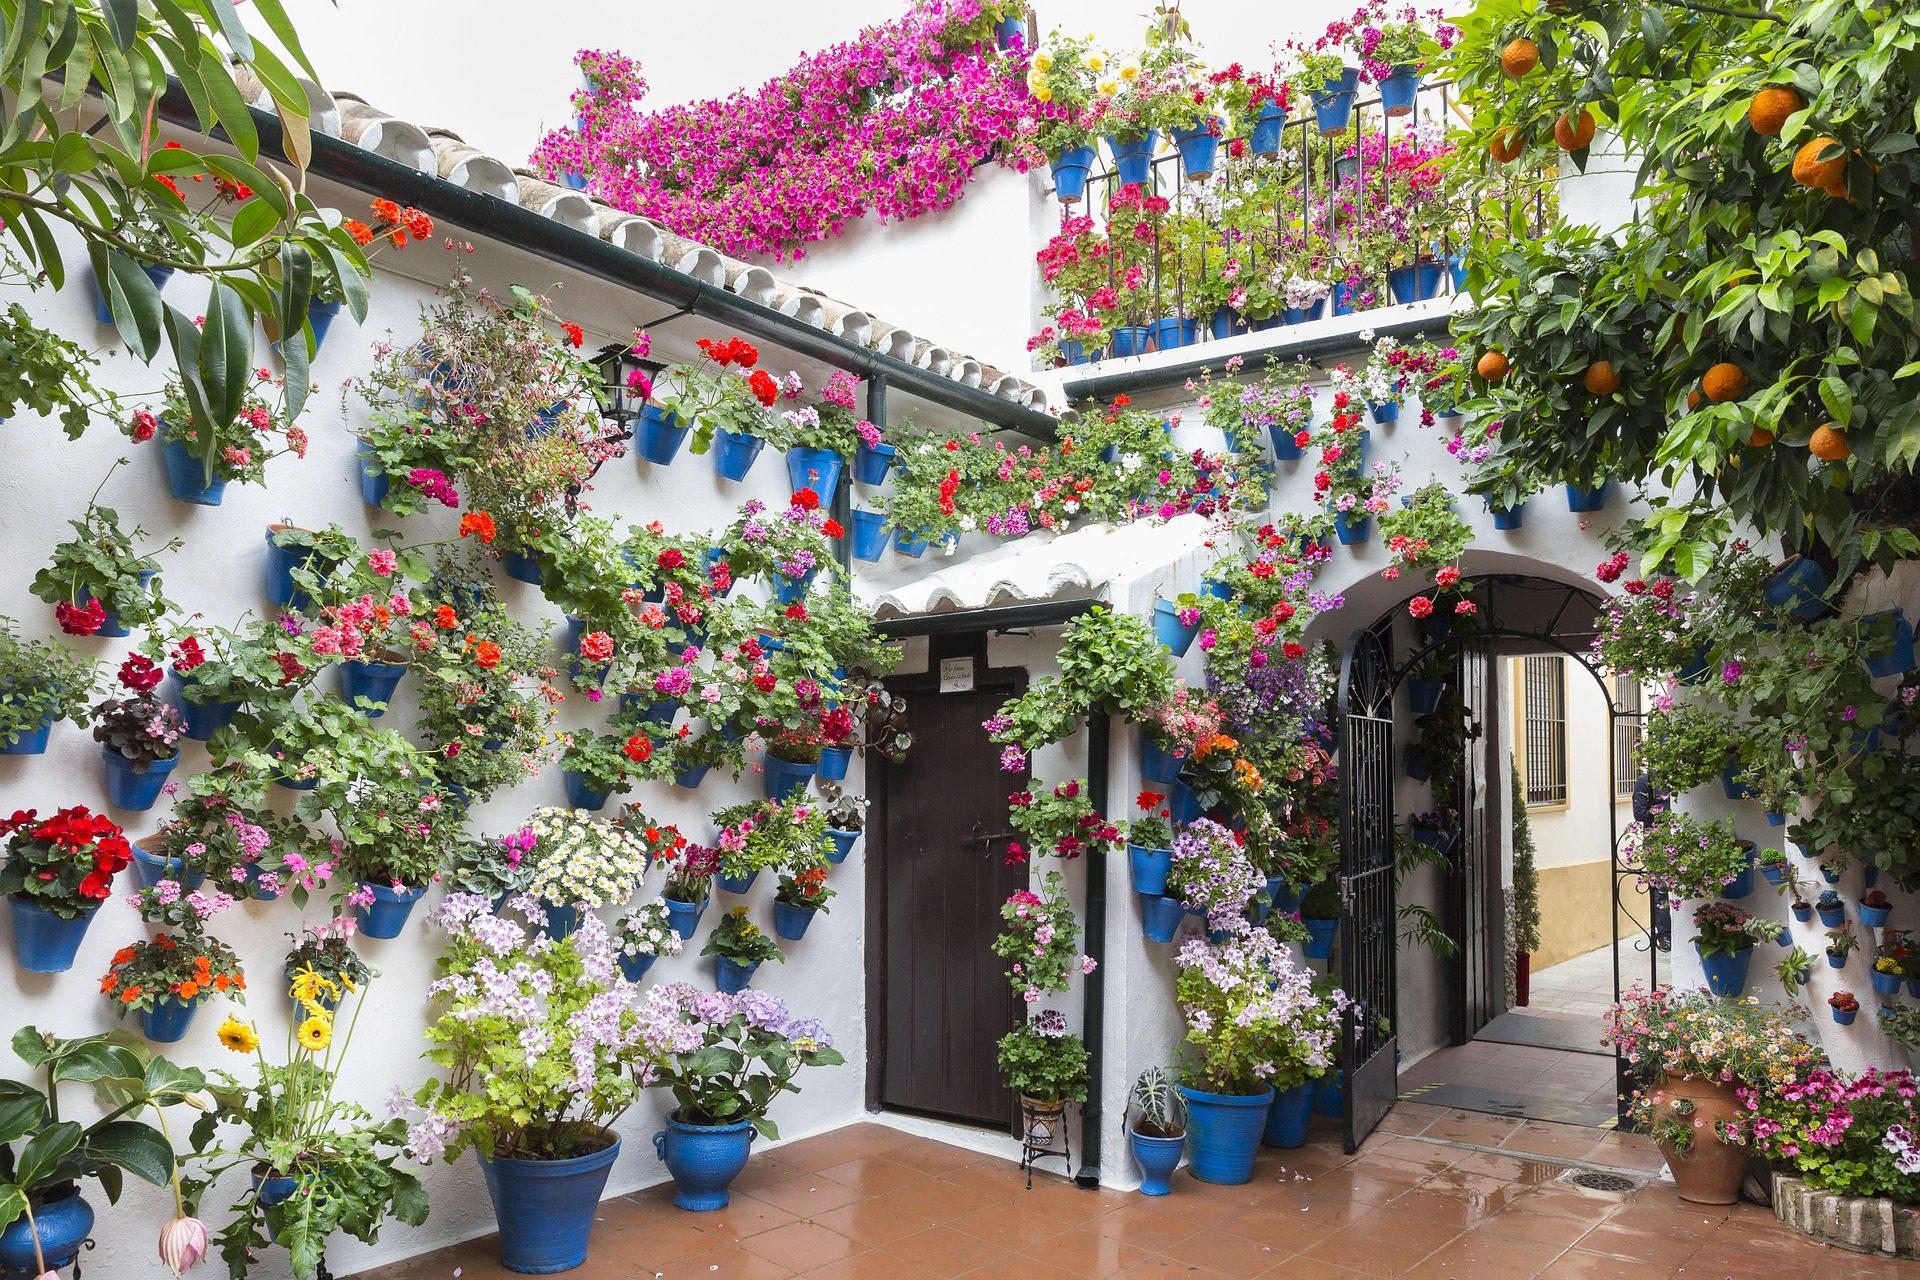 Patio, हाउस, बर्तन, फूल, रंगीन, कॉर्डोबा, स्पेन - HD वॉलपेपर - प्रोफेसर-falken.com